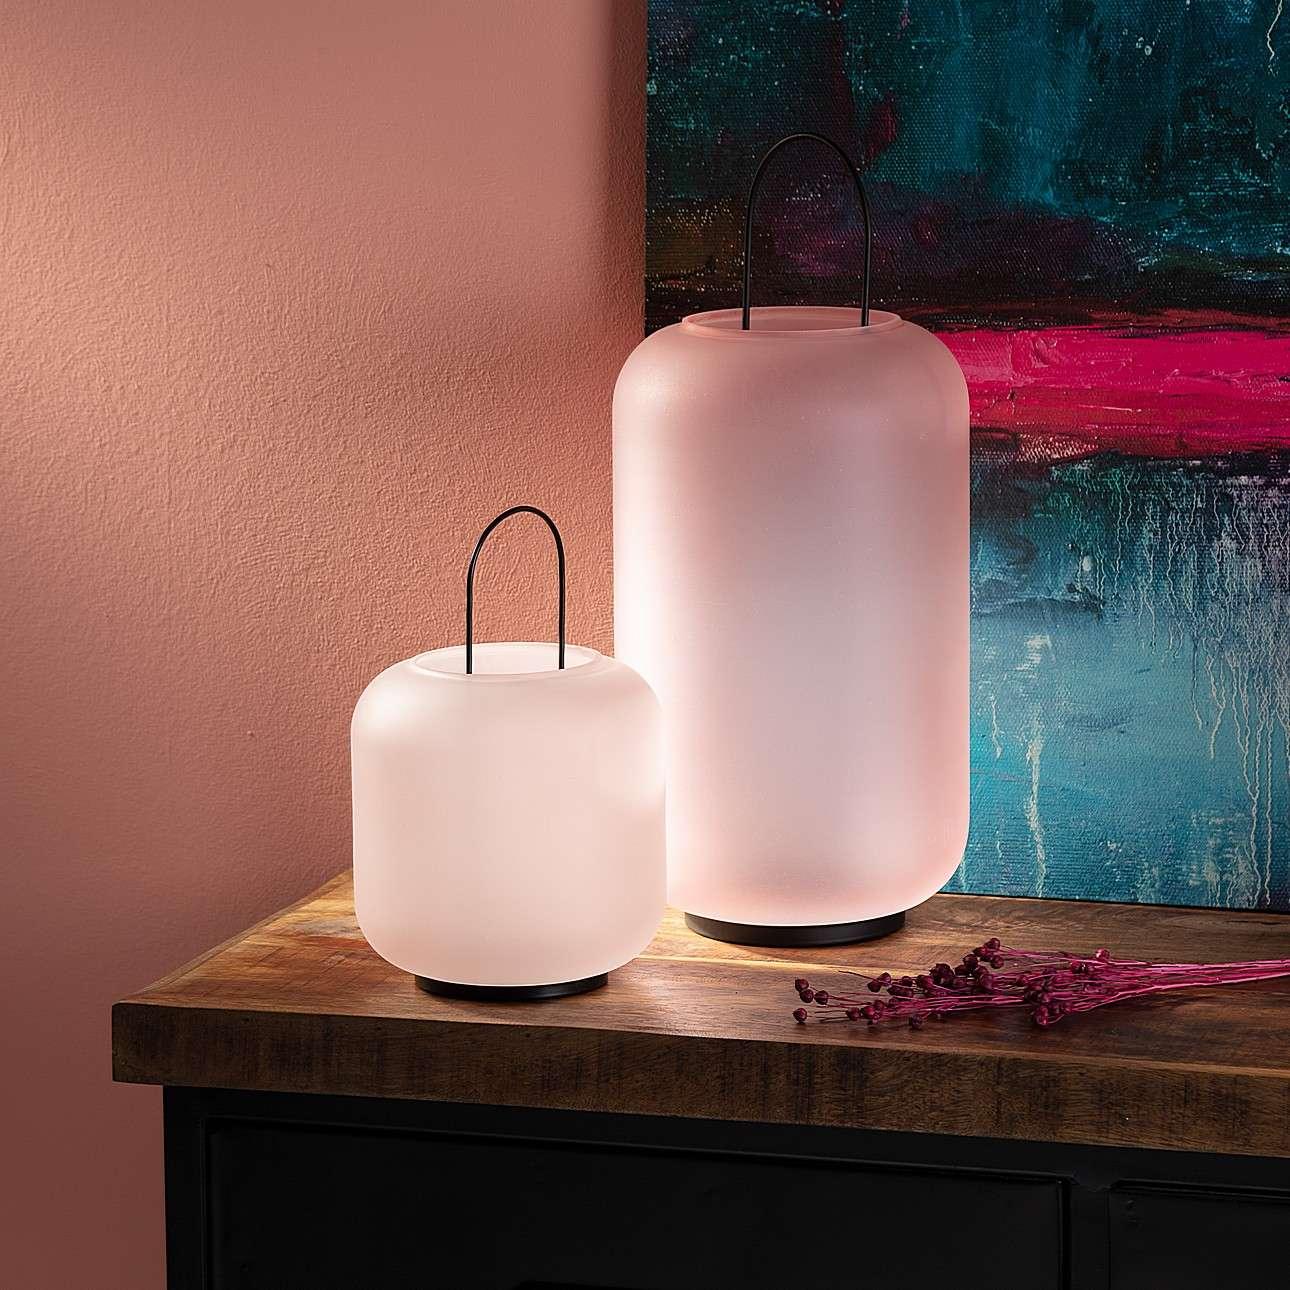 Leuchter/Laterne Pure 45cm pink